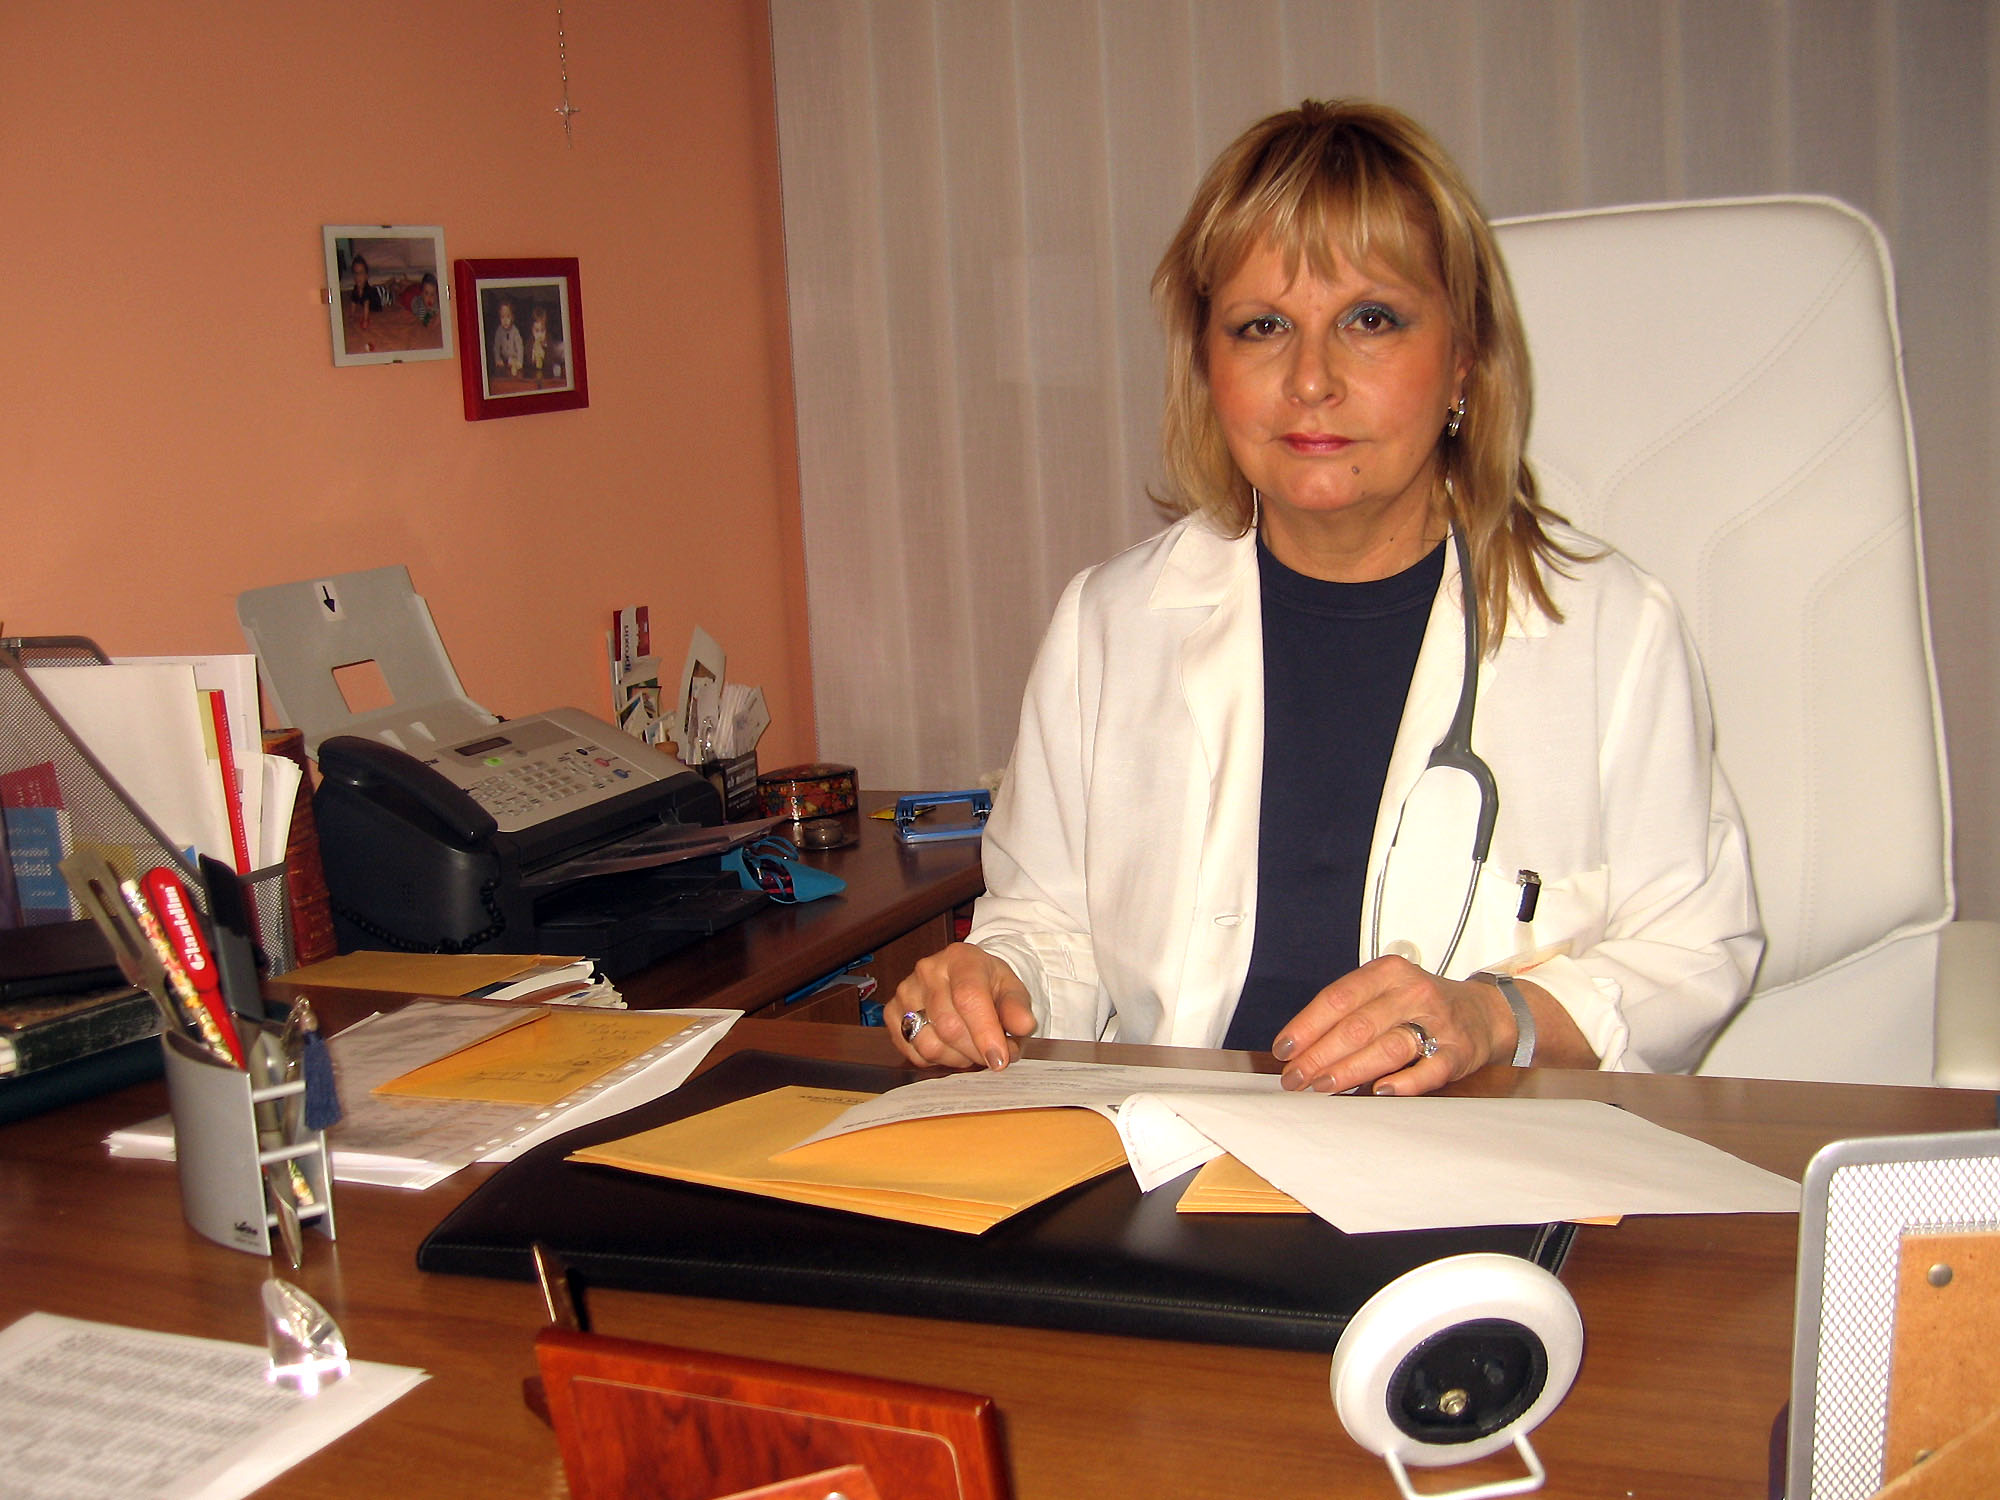 Cristina di lamezia terme - 1 part 2